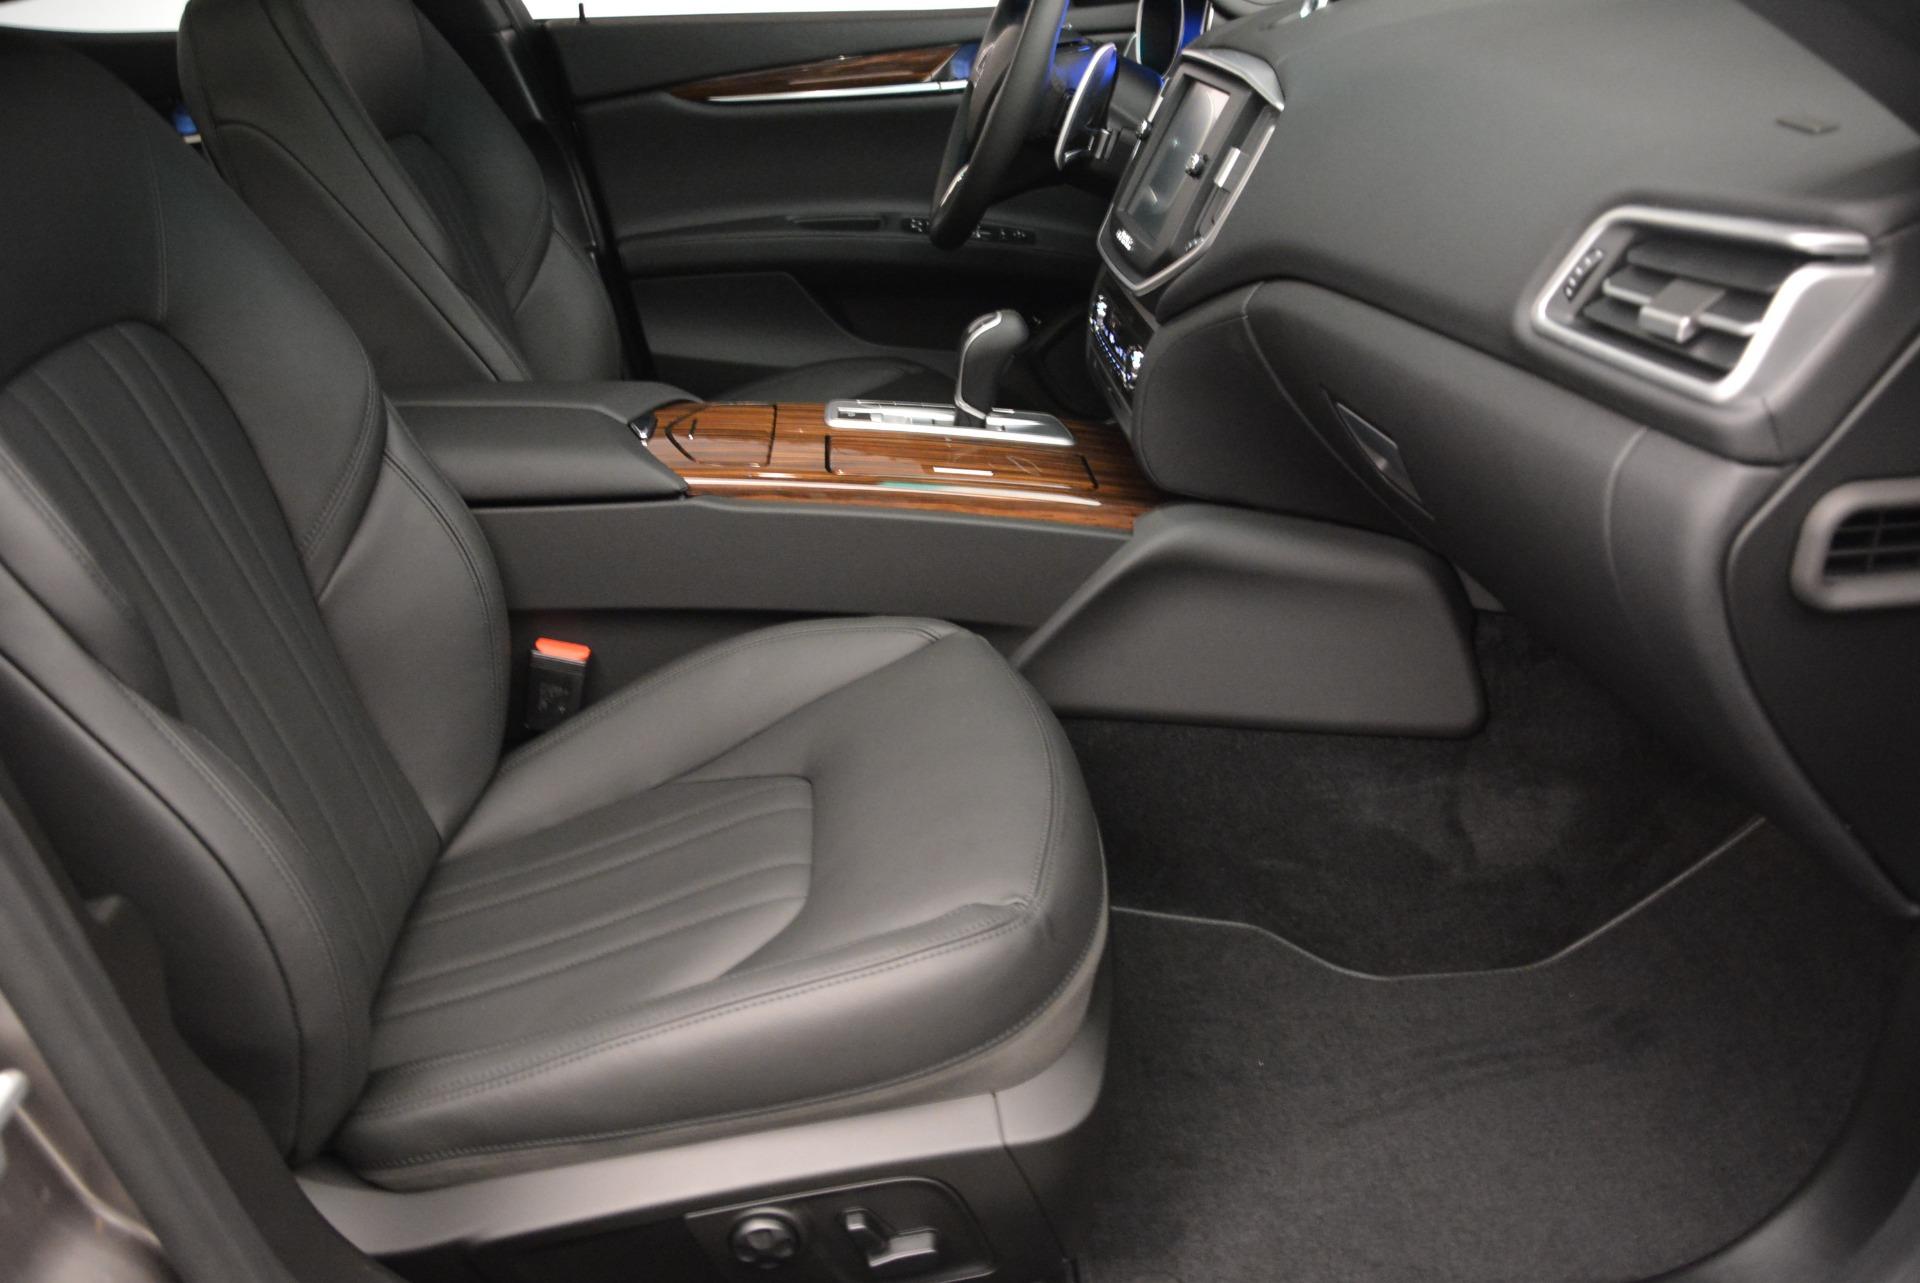 Used 2014 Maserati Ghibli S Q4 For Sale In Greenwich, CT 2562_p21